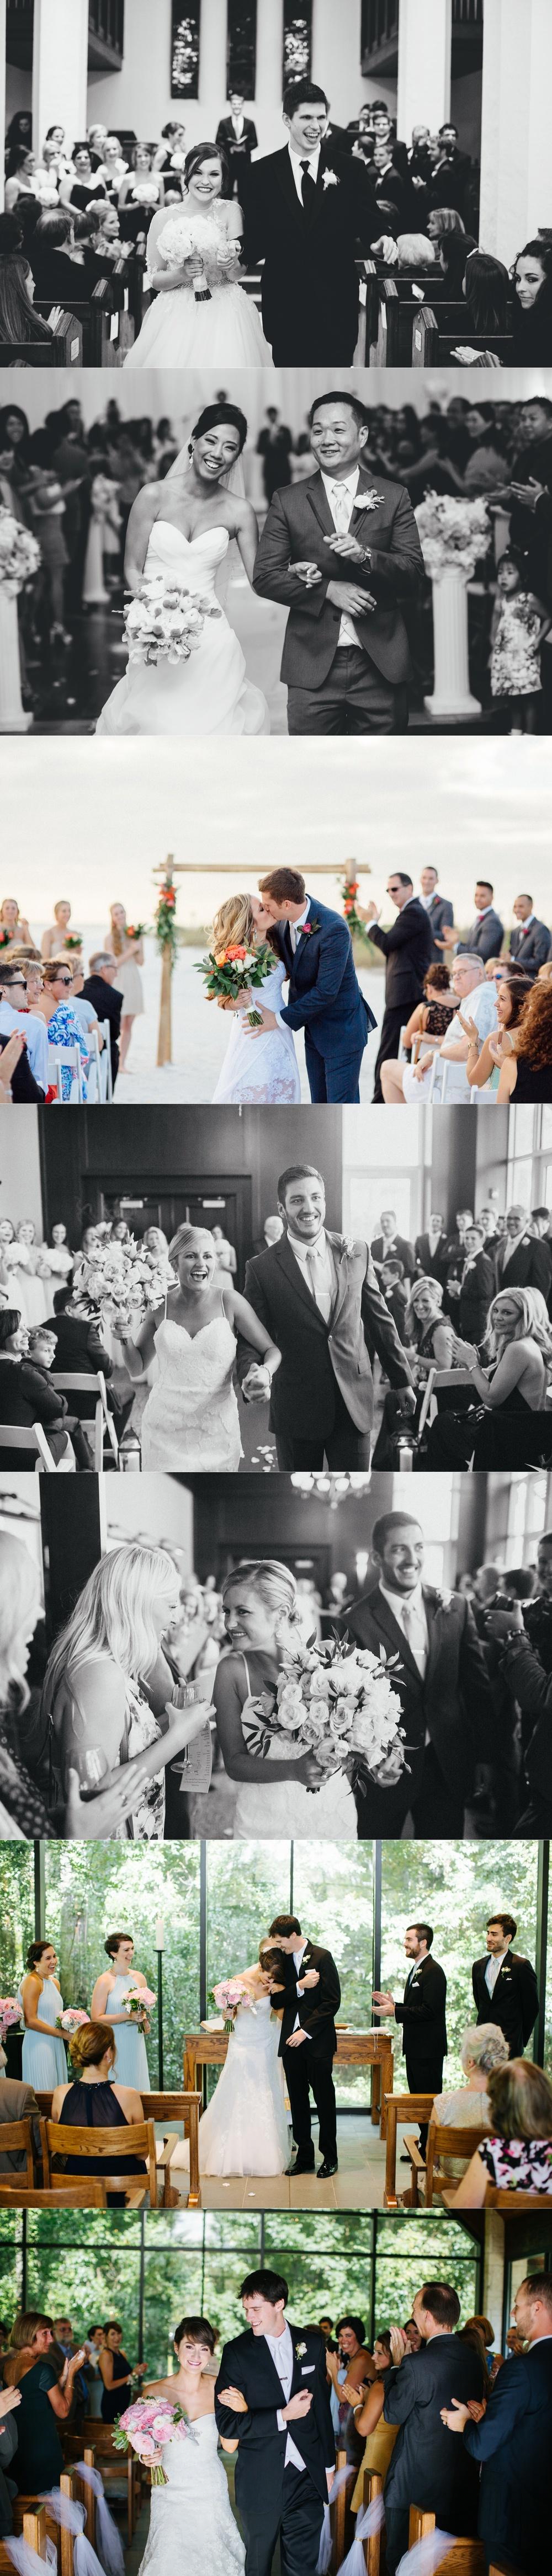 jake-and-katie-wedding-favorites-2015-33